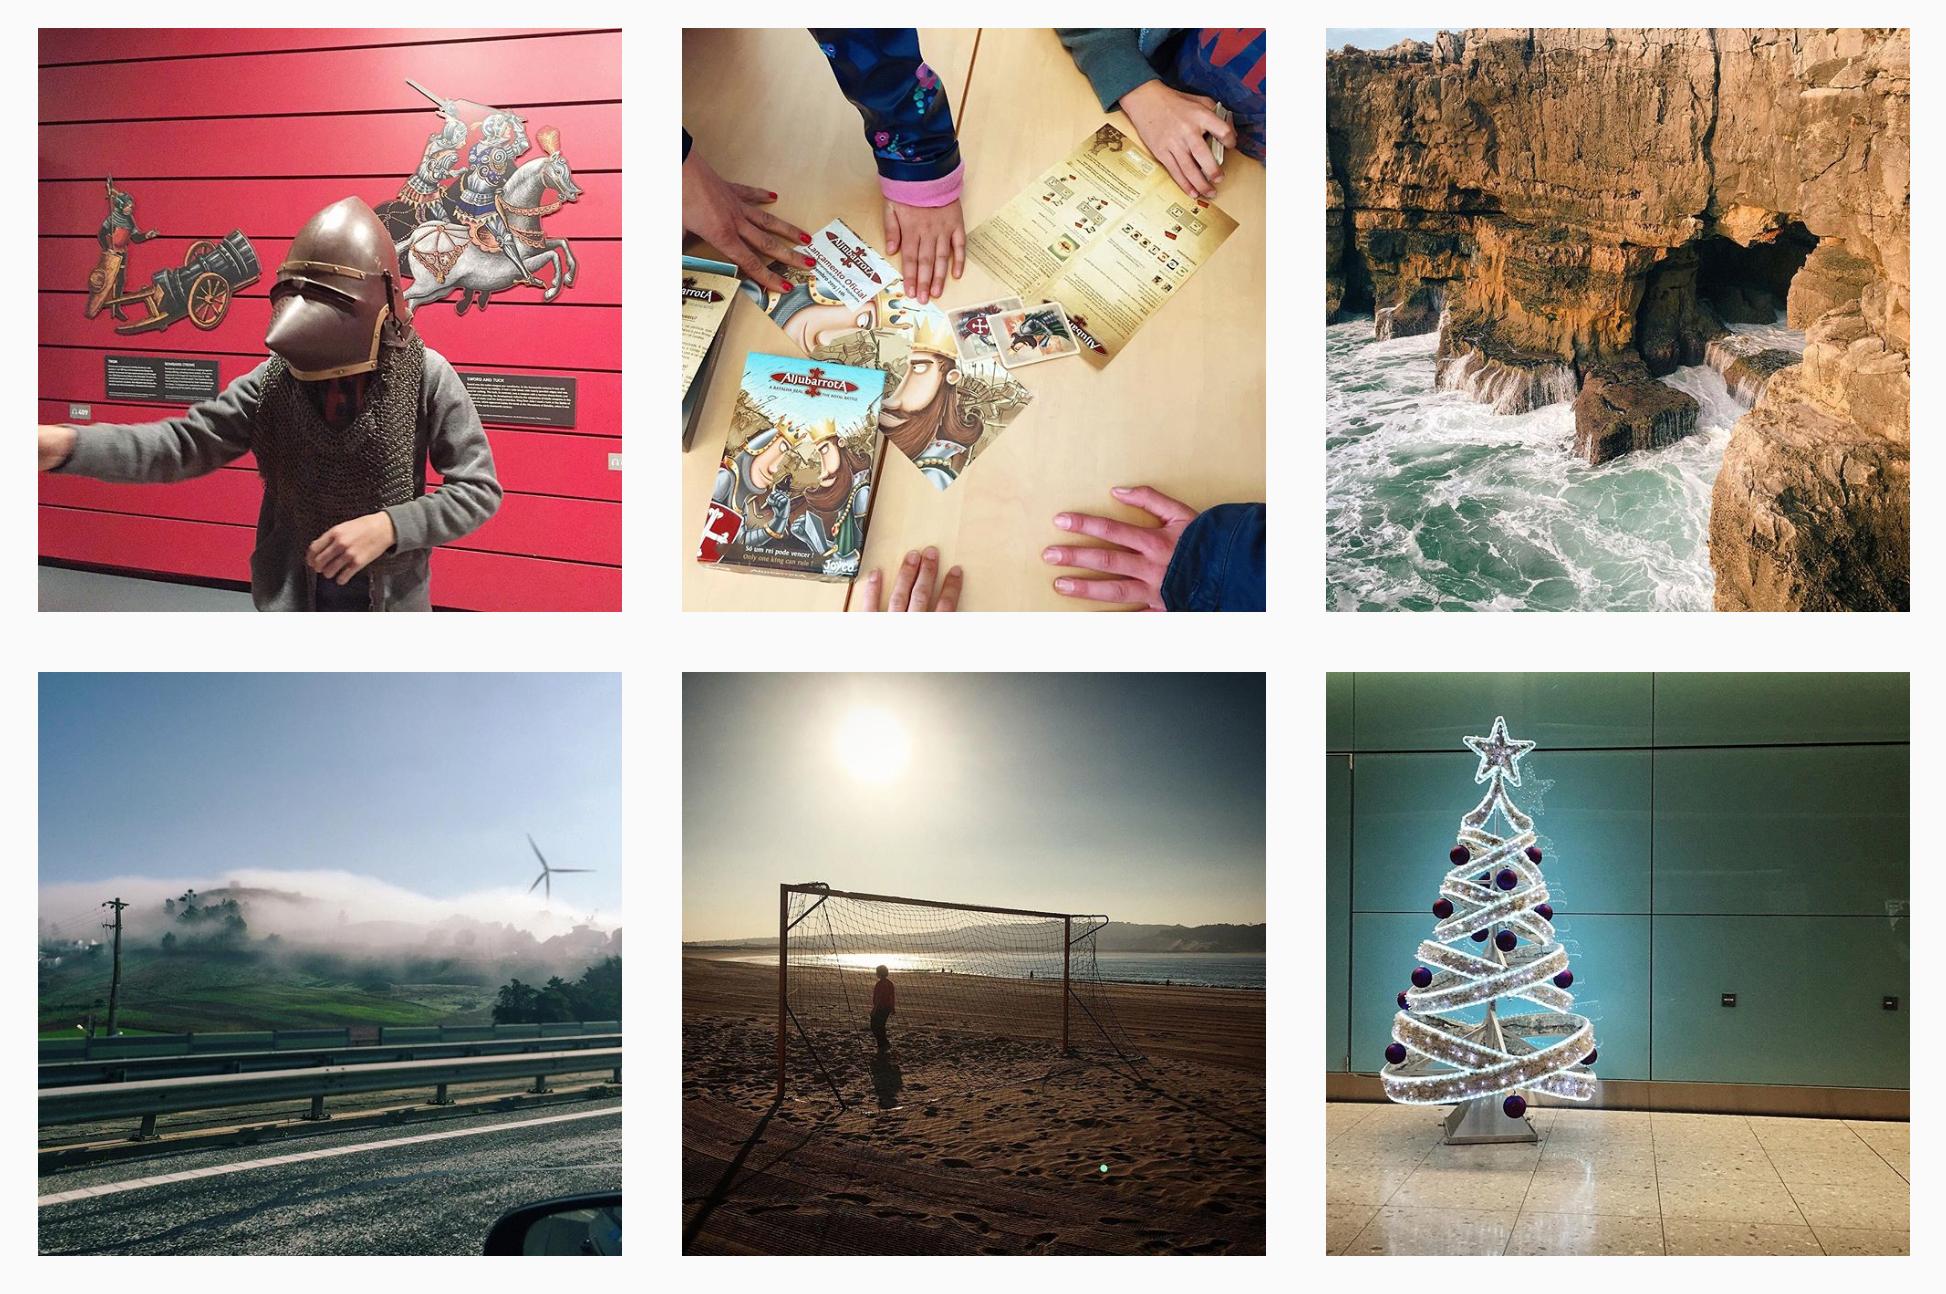 instagram viajar em familia 6